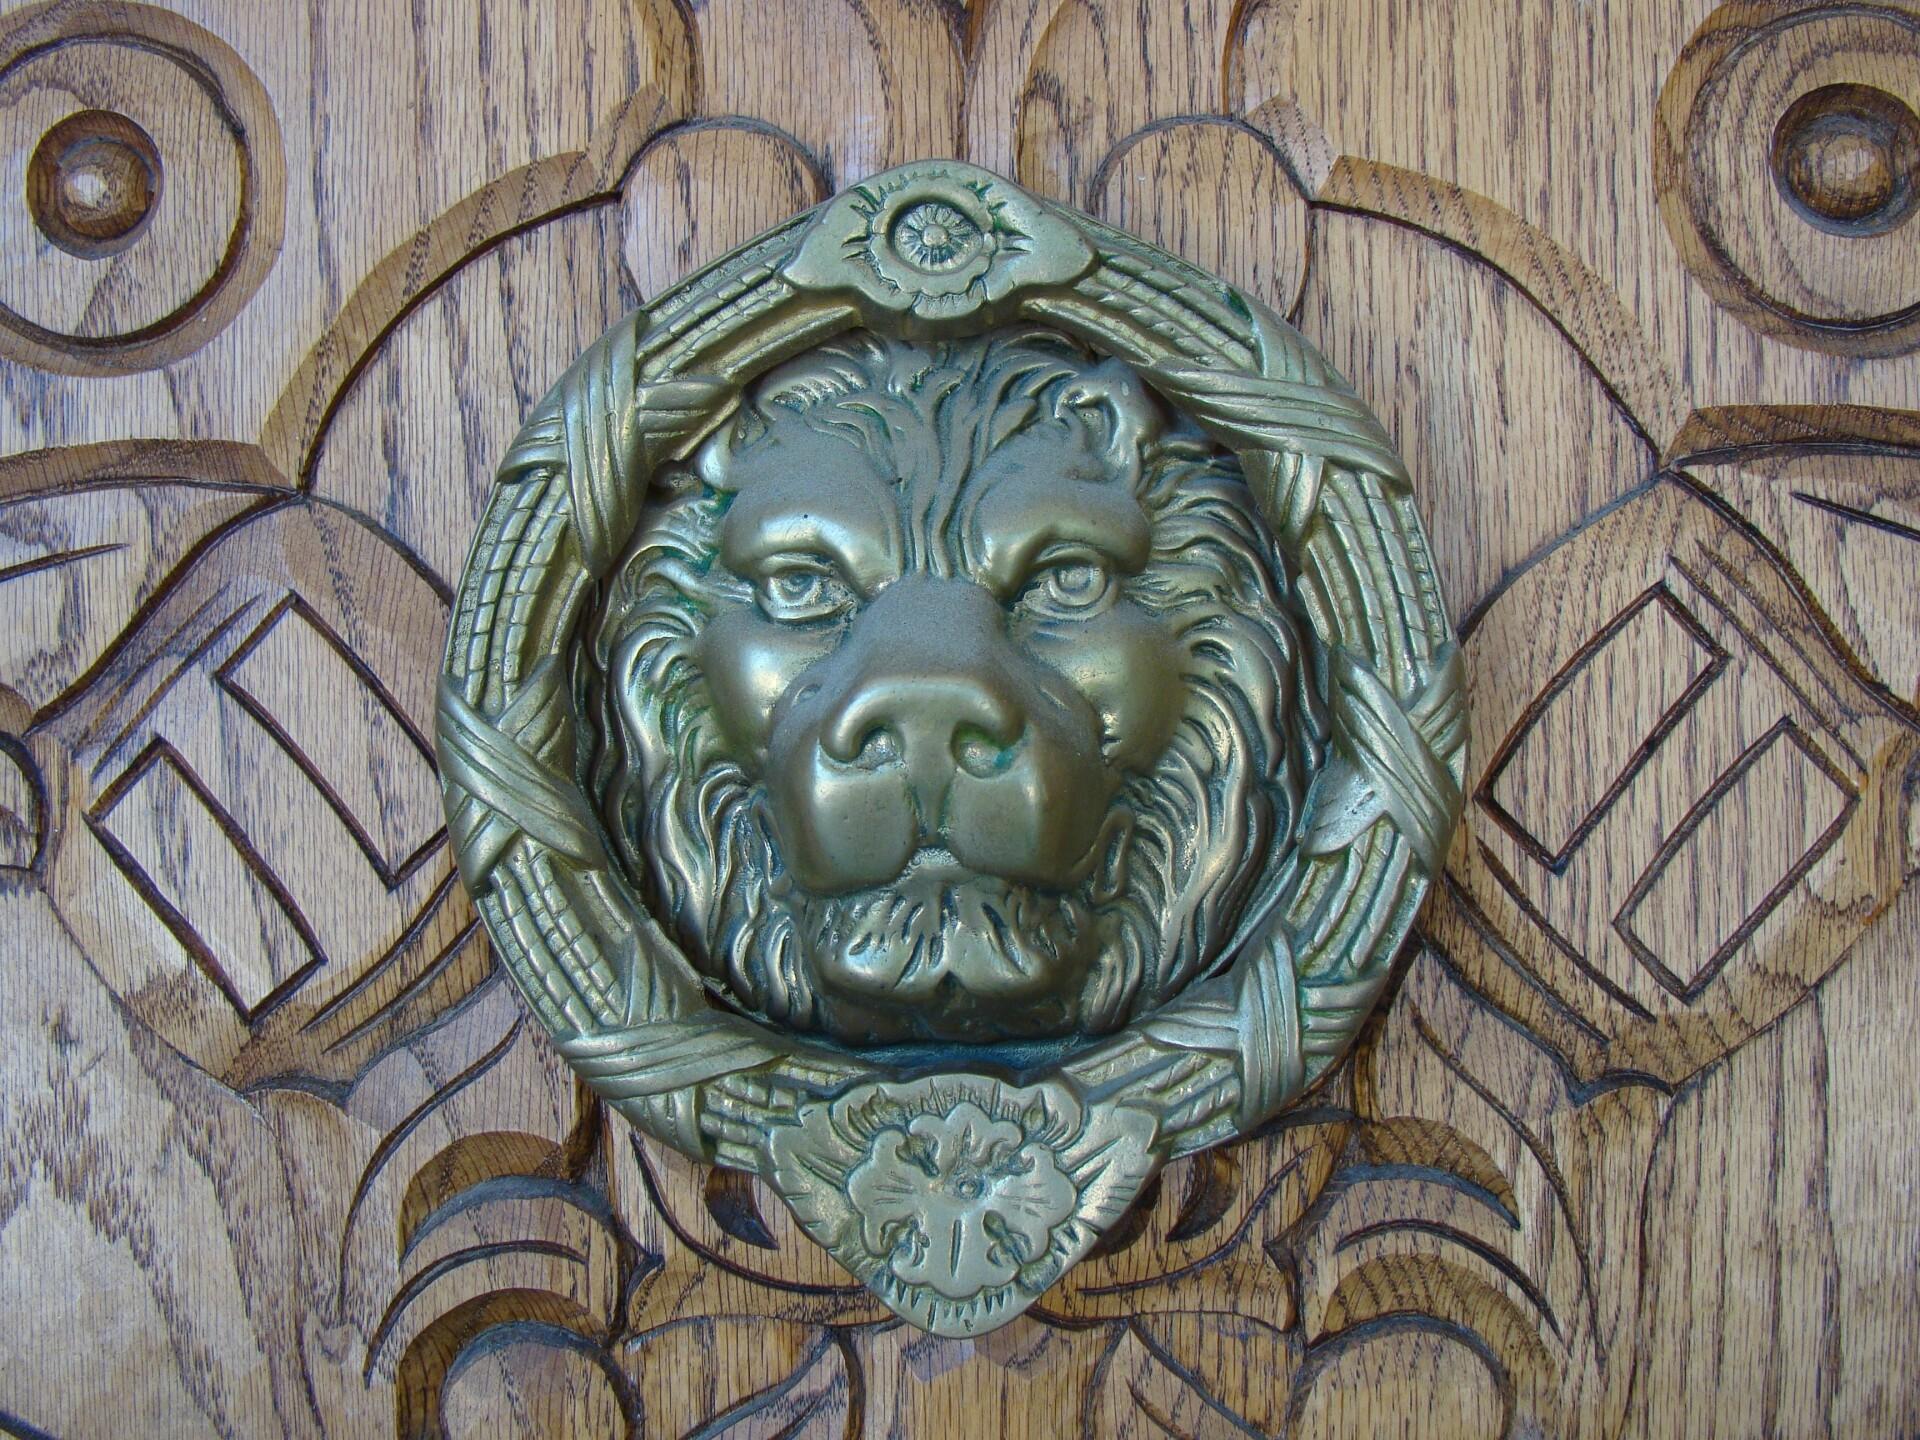 Castle Caenen Entry lion knocker antique .jpg